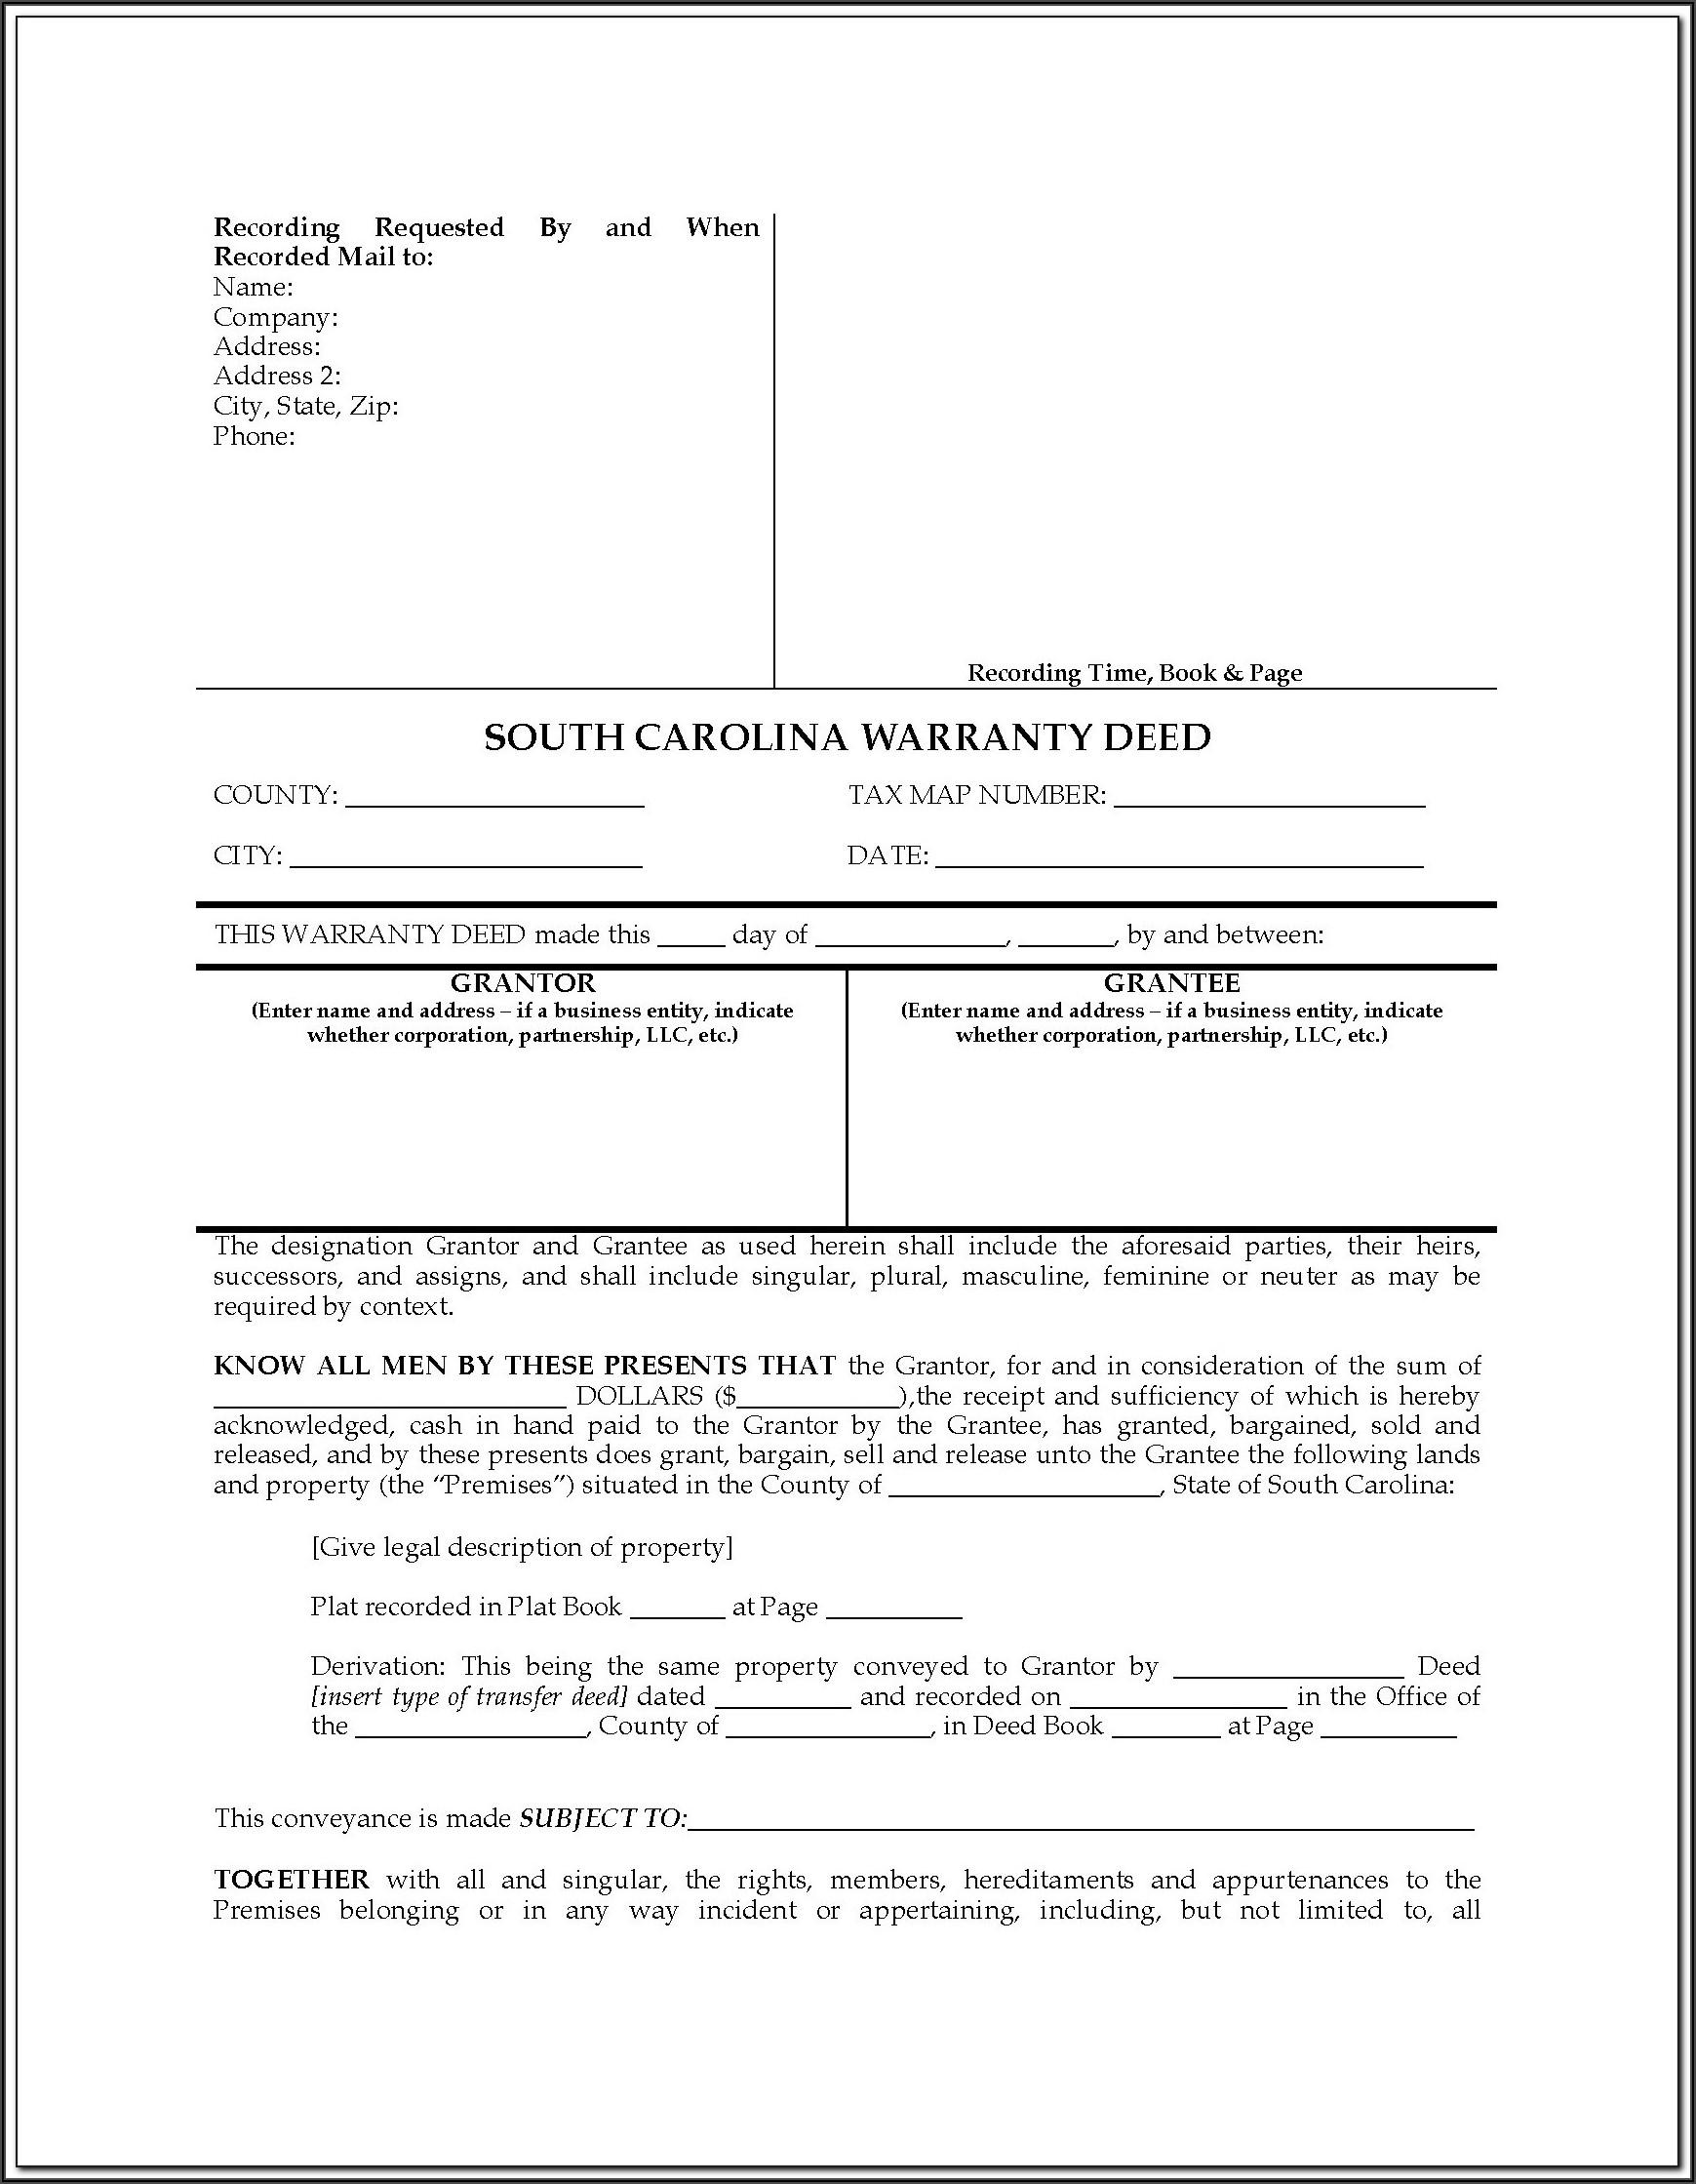 South Carolina Deed Of Distribution Form